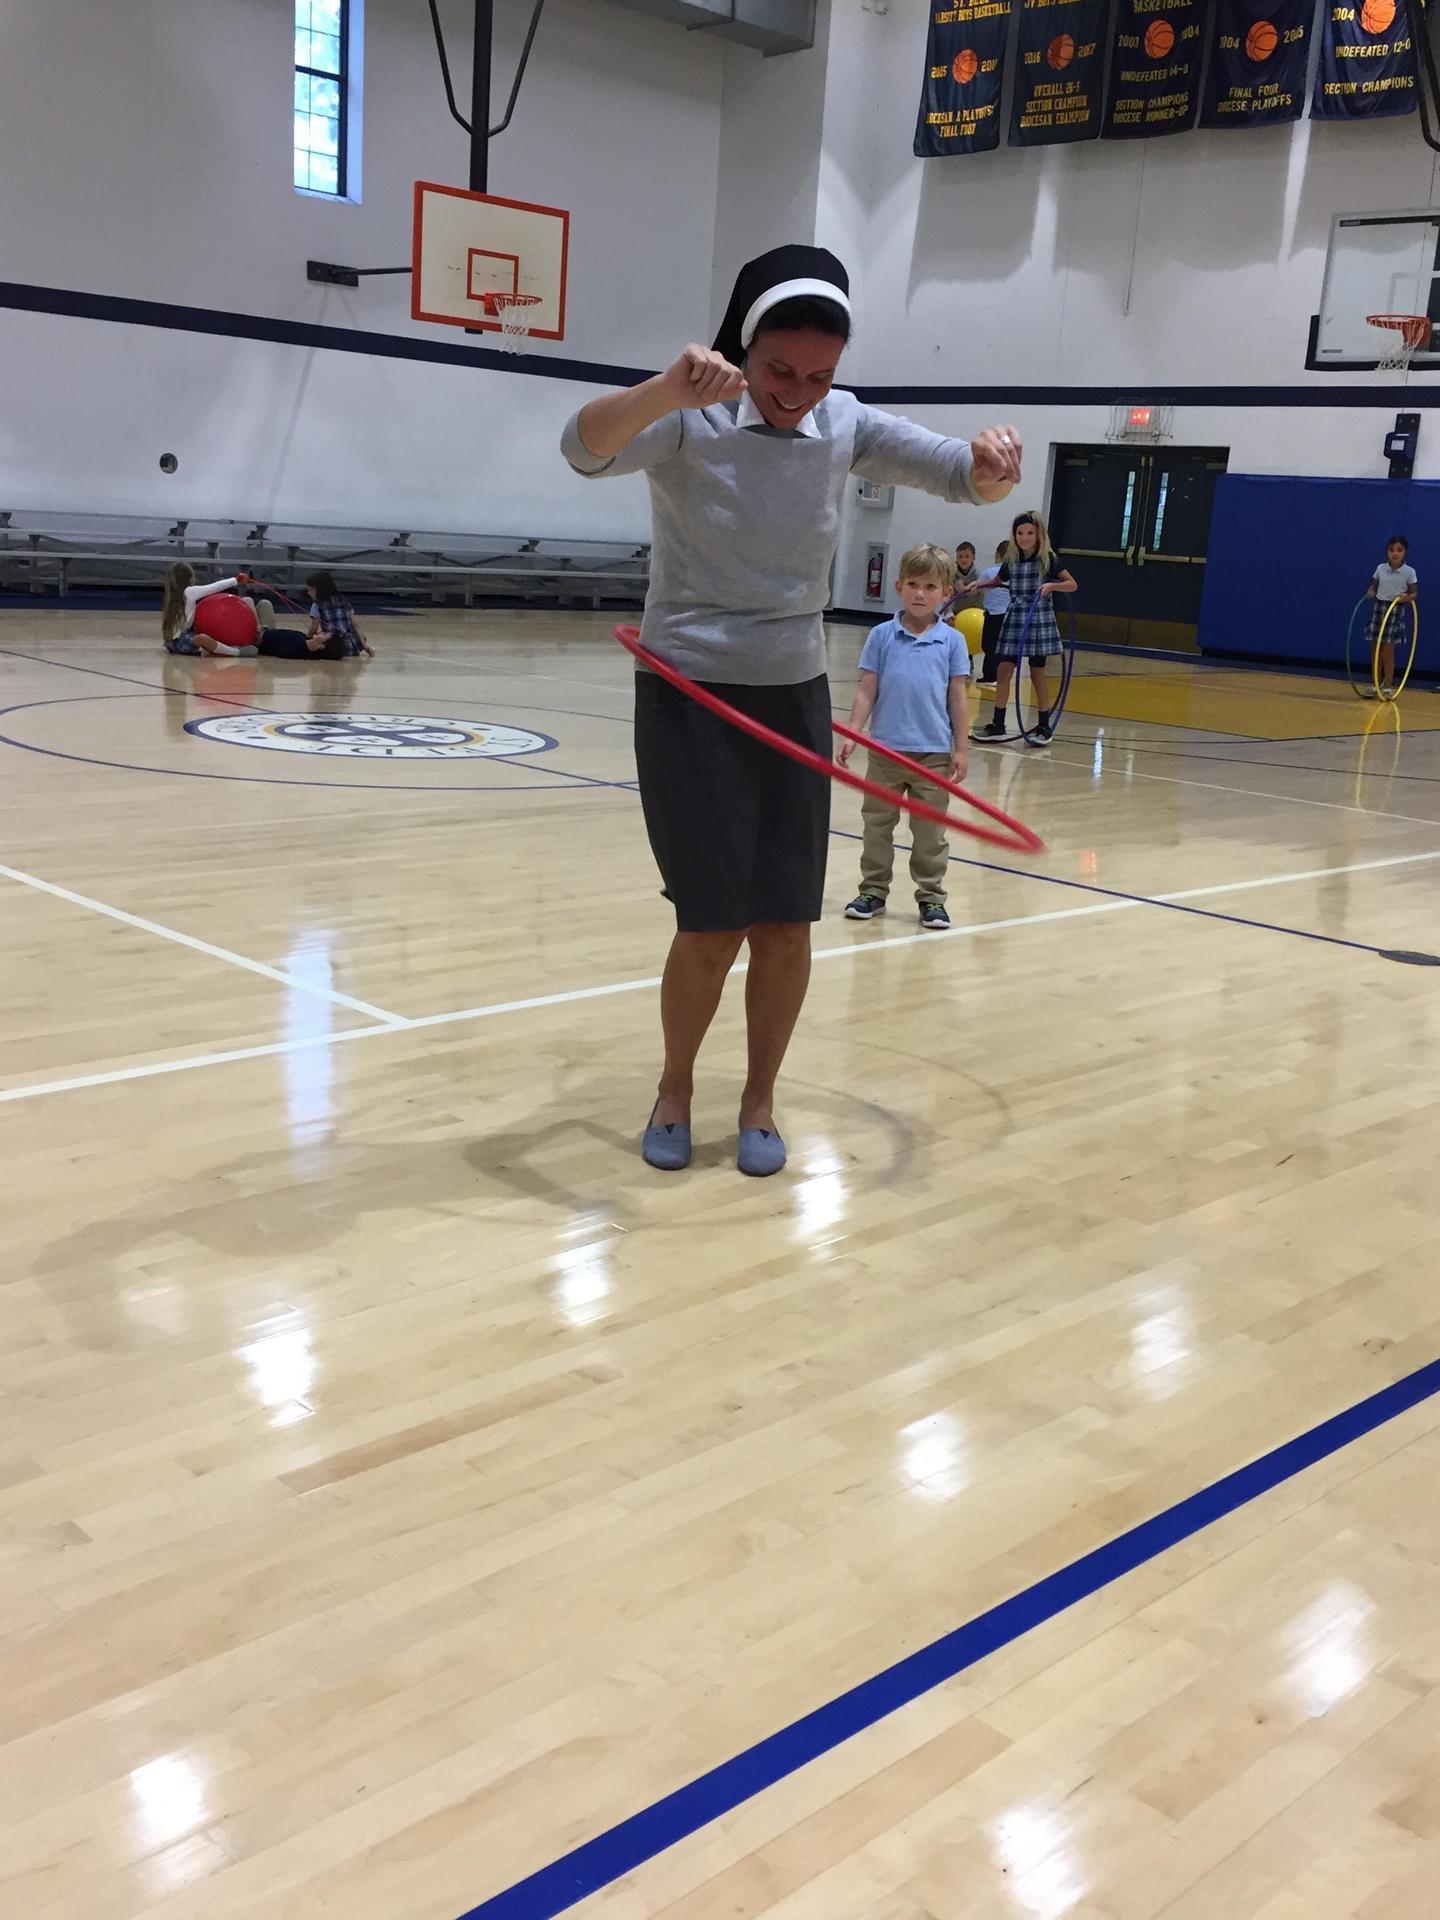 Principal hoola hoop